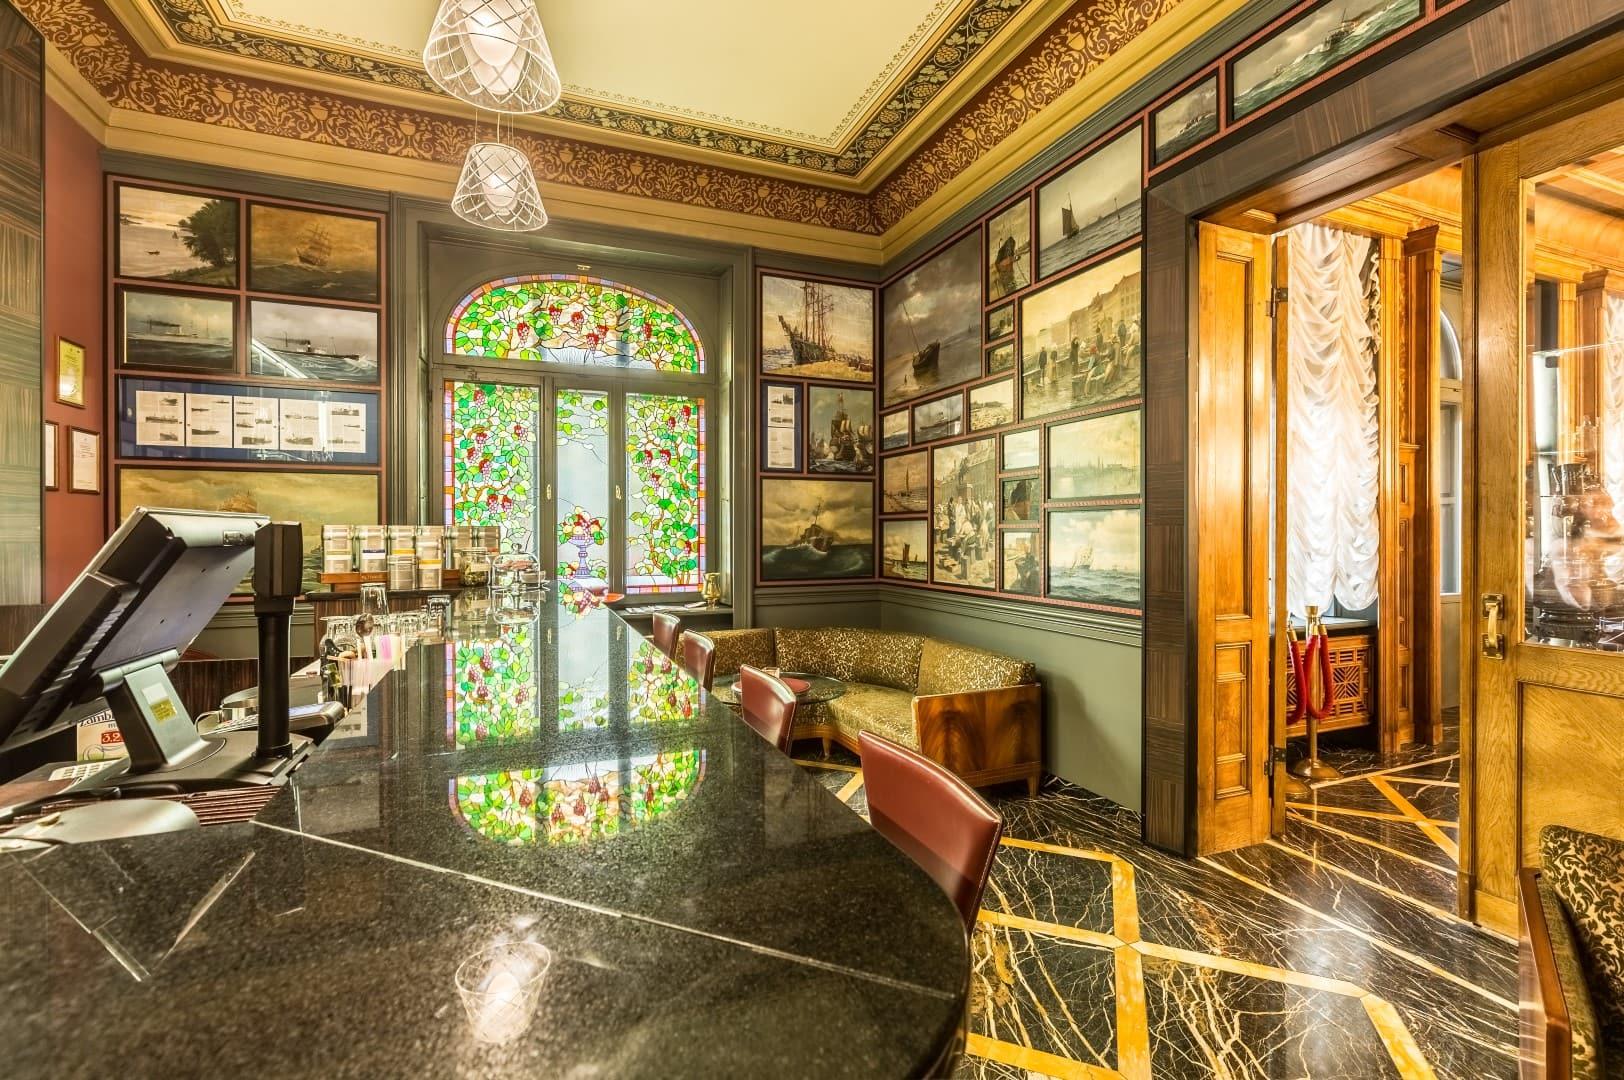 Gallery Park Hotel & Spa Bar